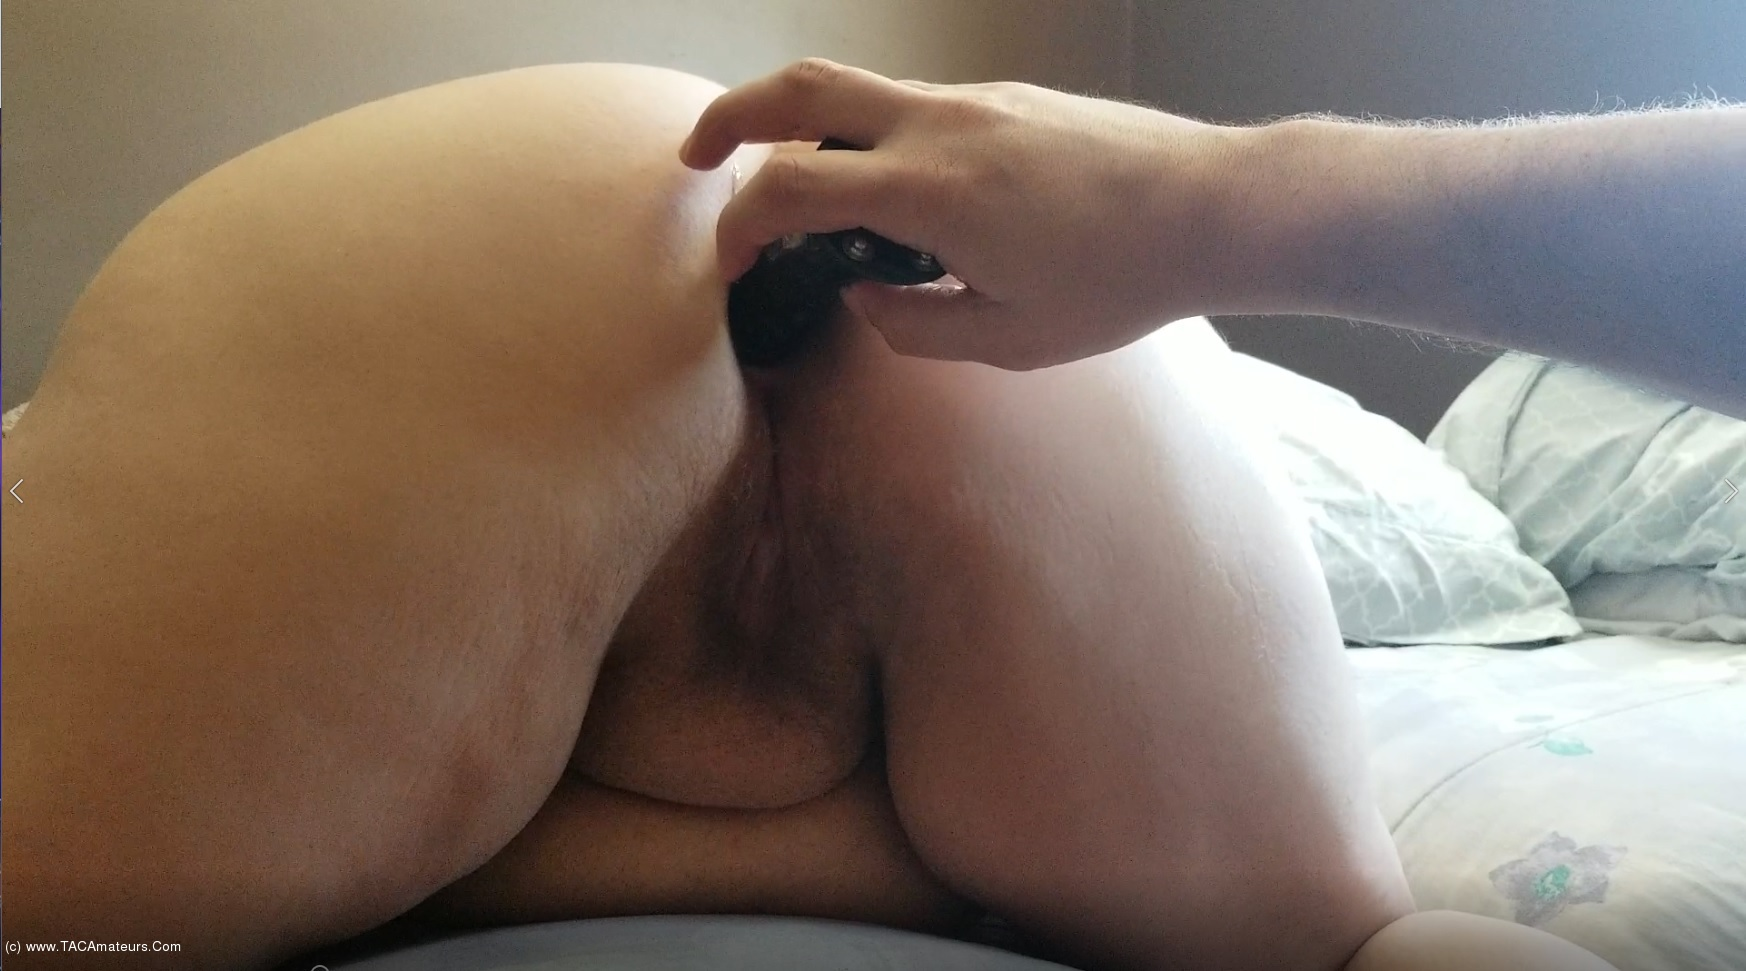 SexyNEBBW - Arsehole Getting Cum Pt1 scene 0